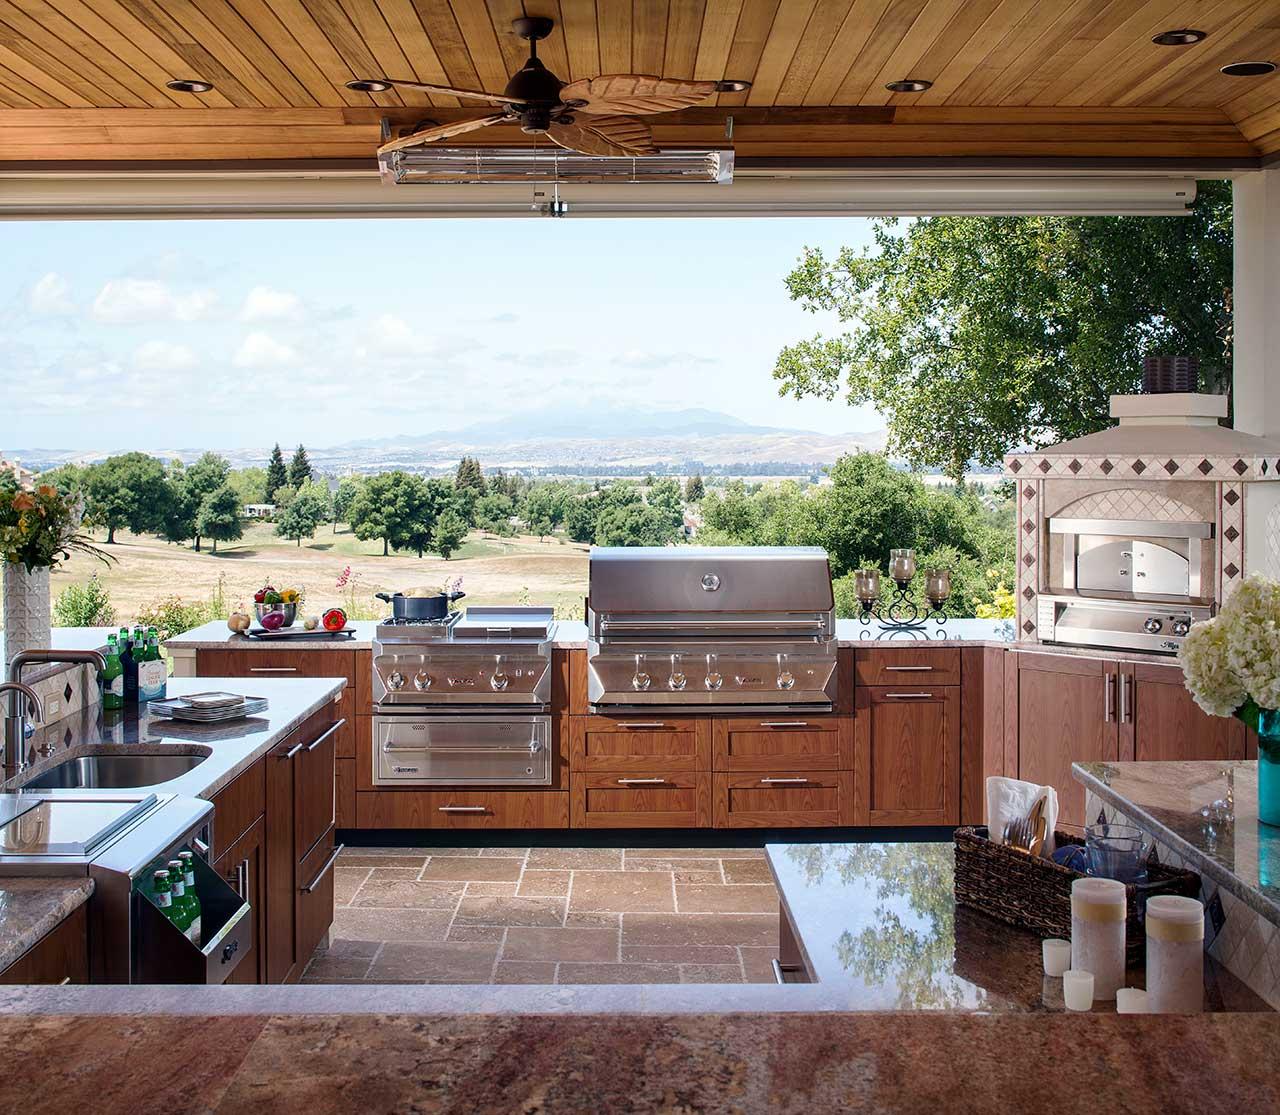 Outdoor Kitchen Design Ideas | Brown Jordan Outdoor Kitchens on Backyard Kitchen Design id=91440